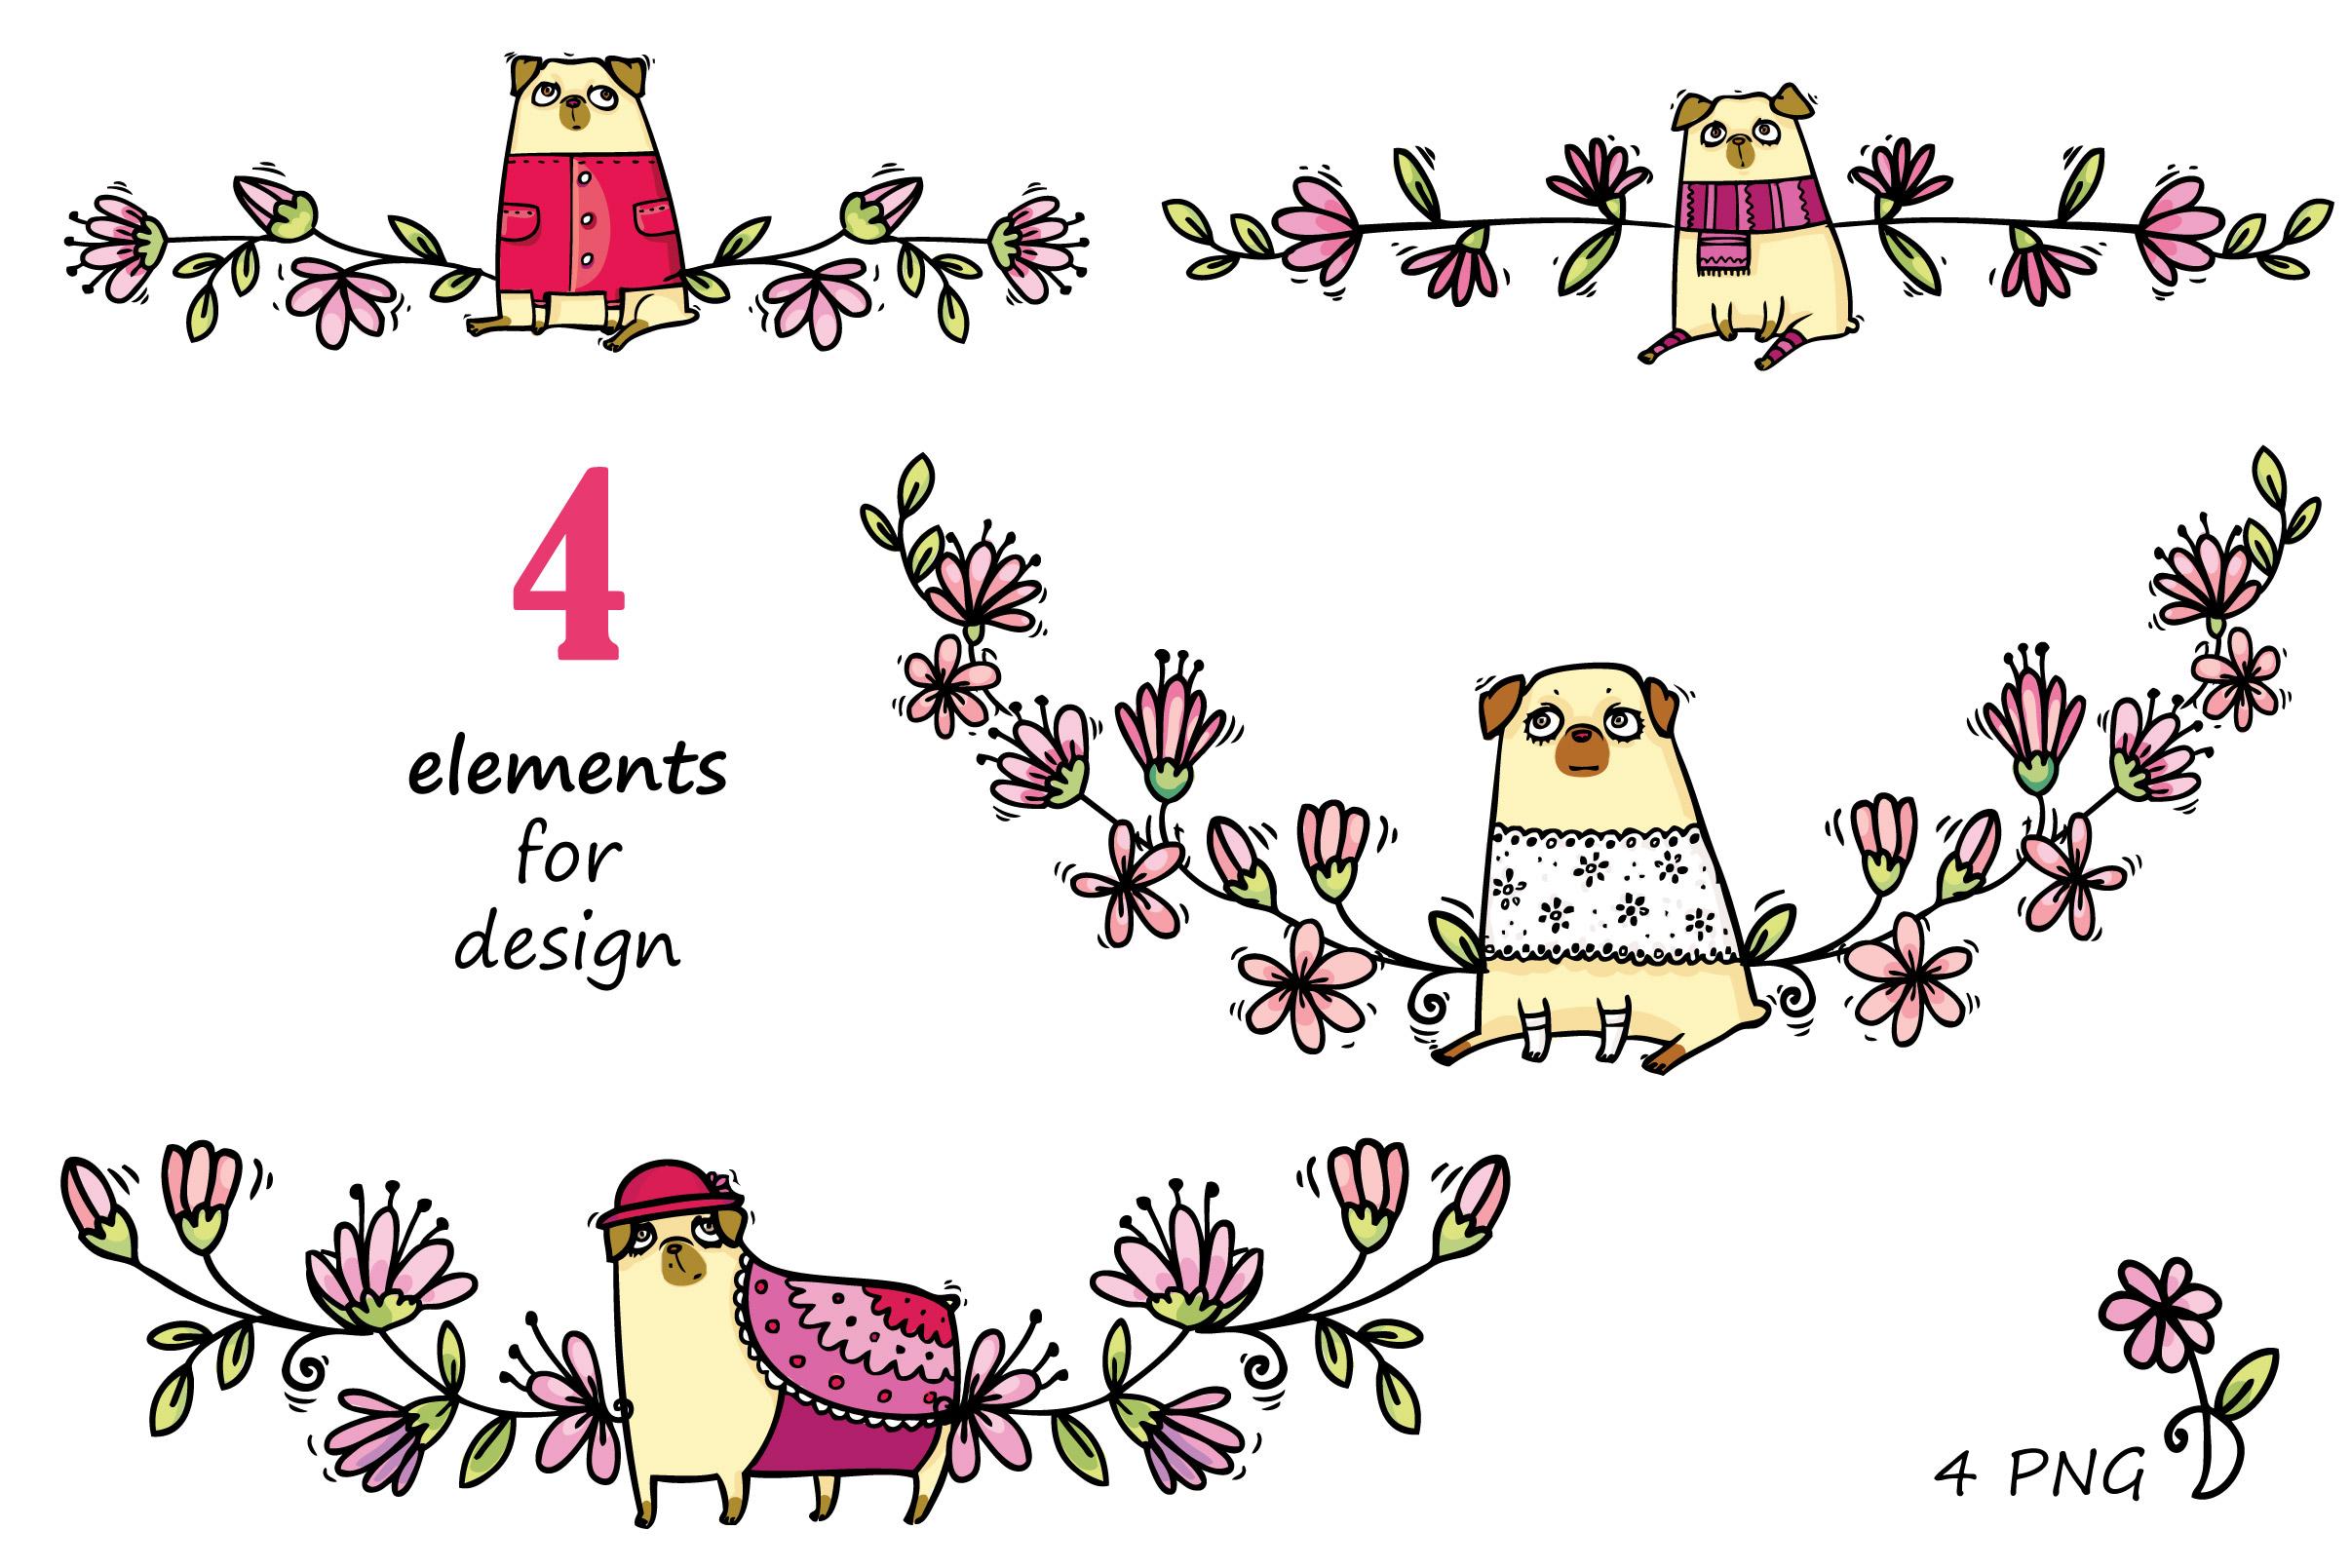 Pugs&Magnolias 29 elements example image 4